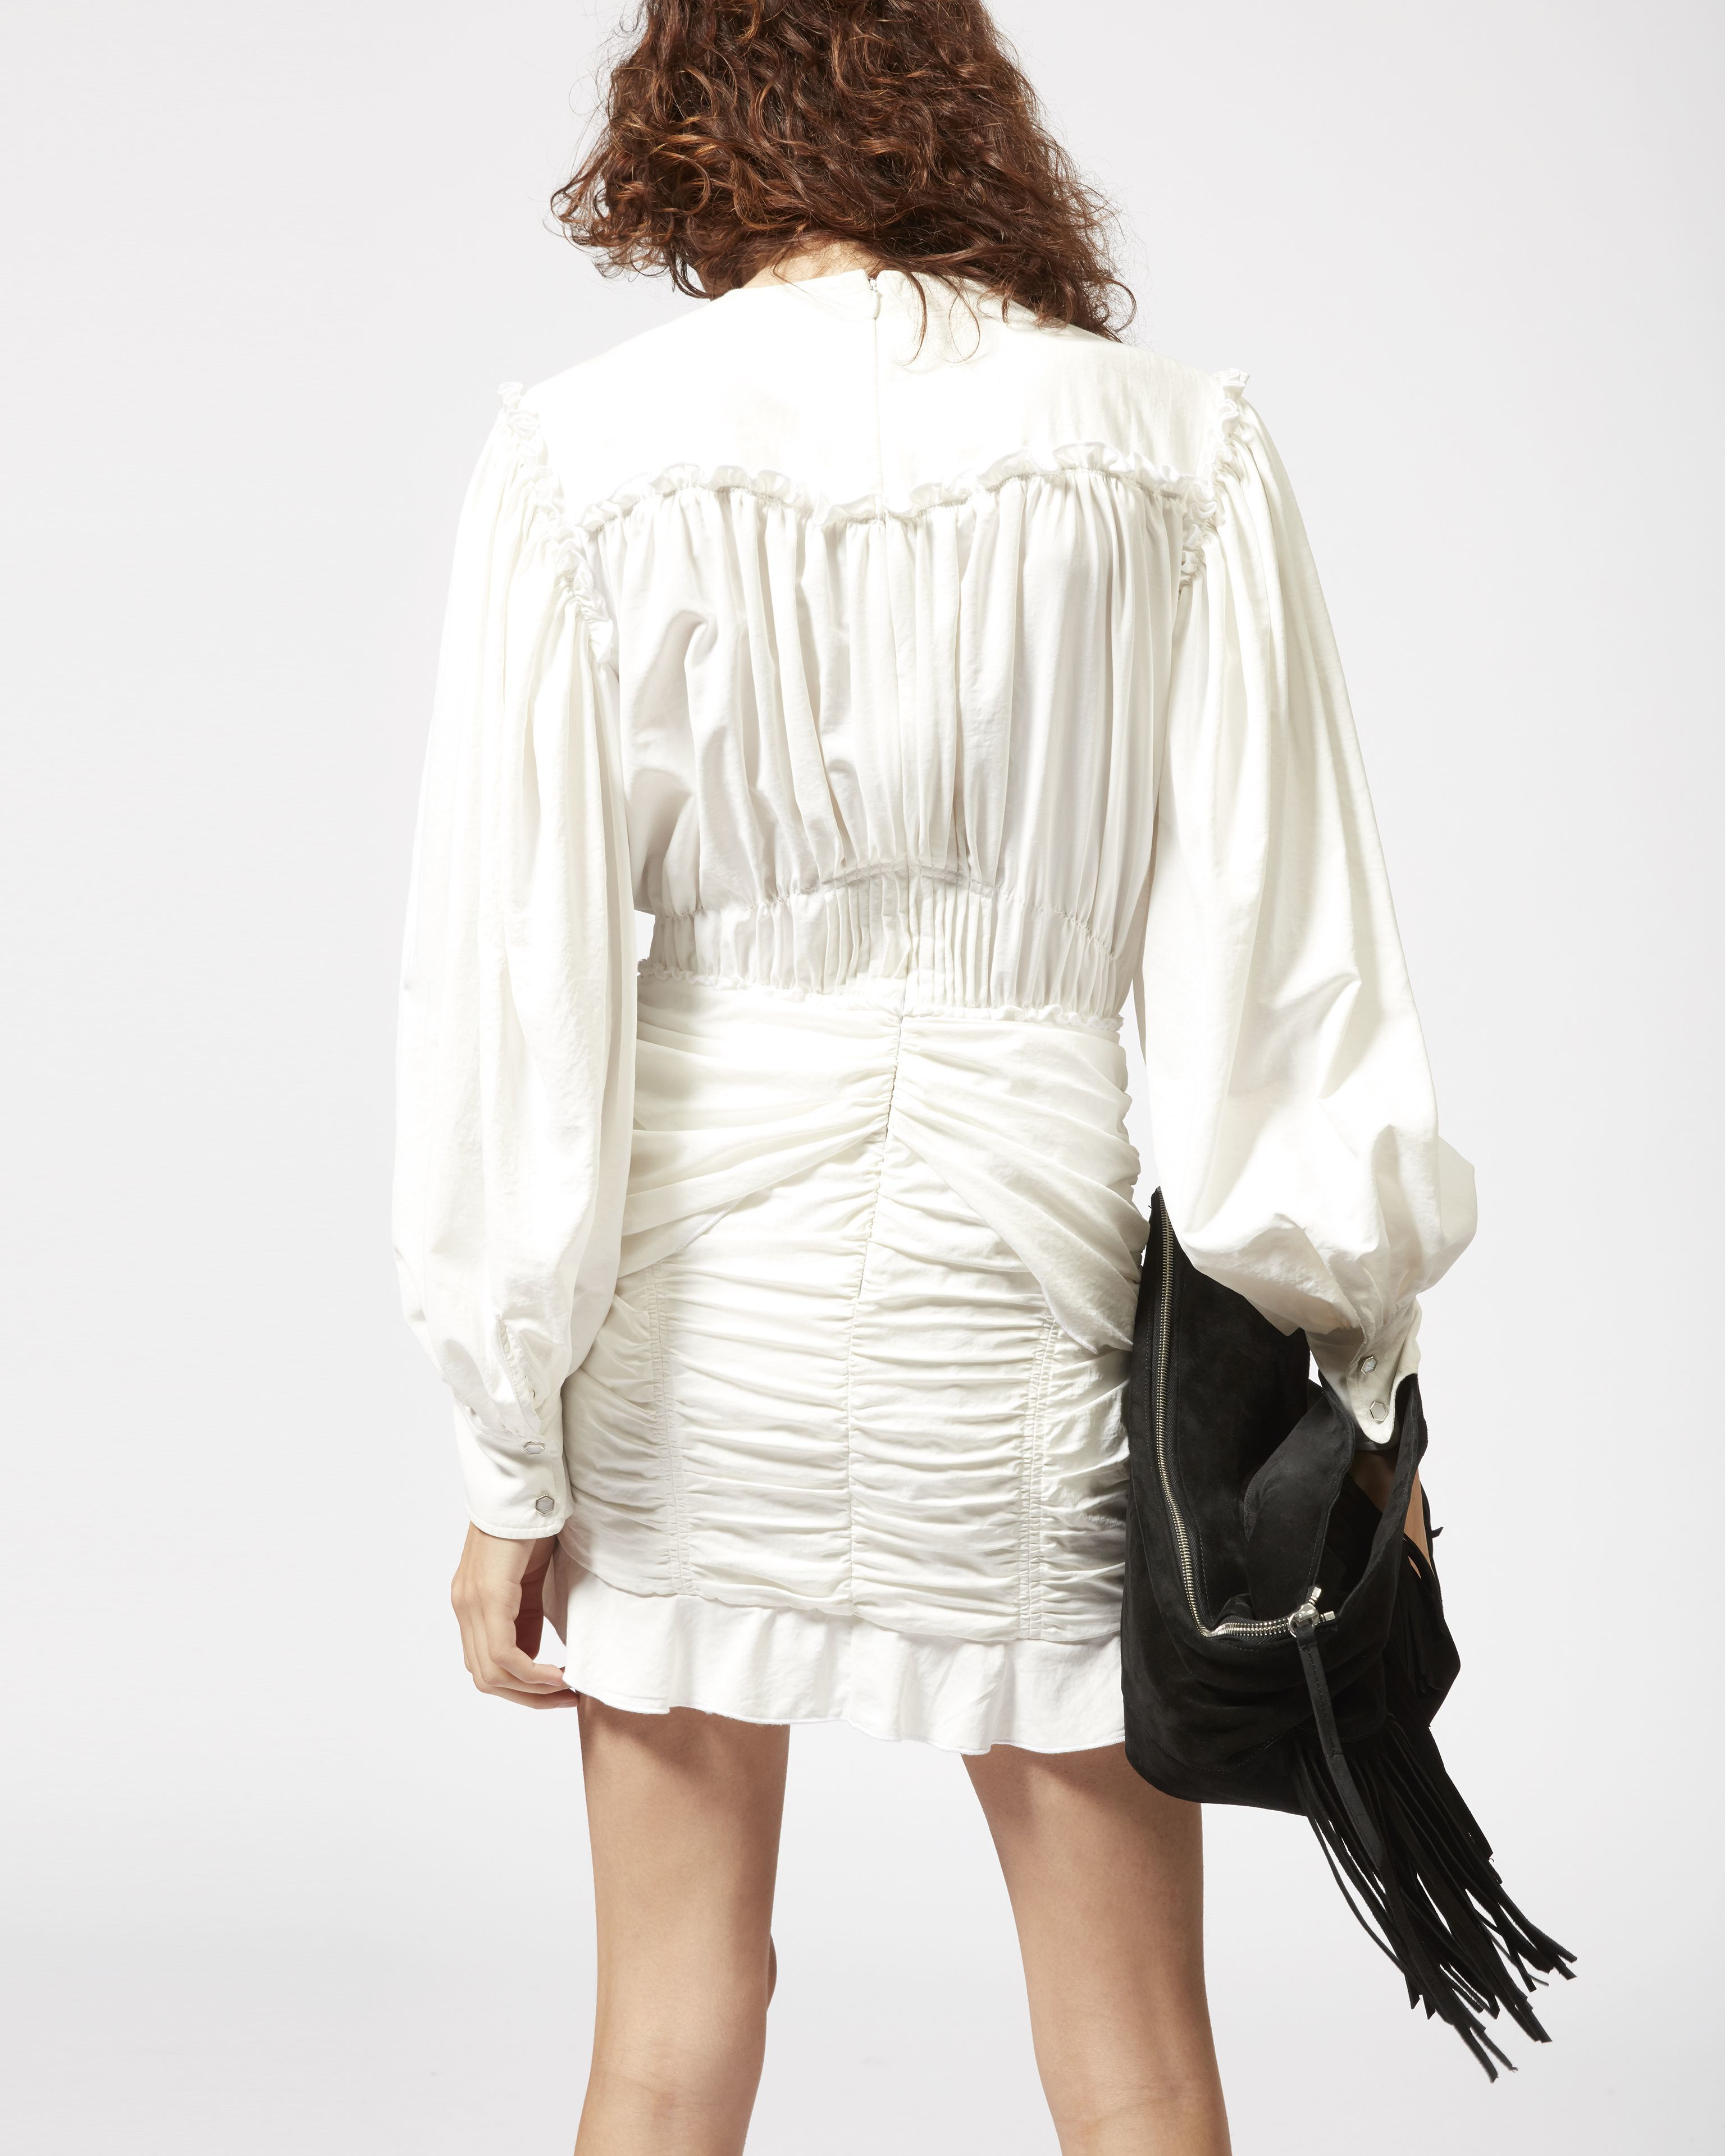 UNICE dress